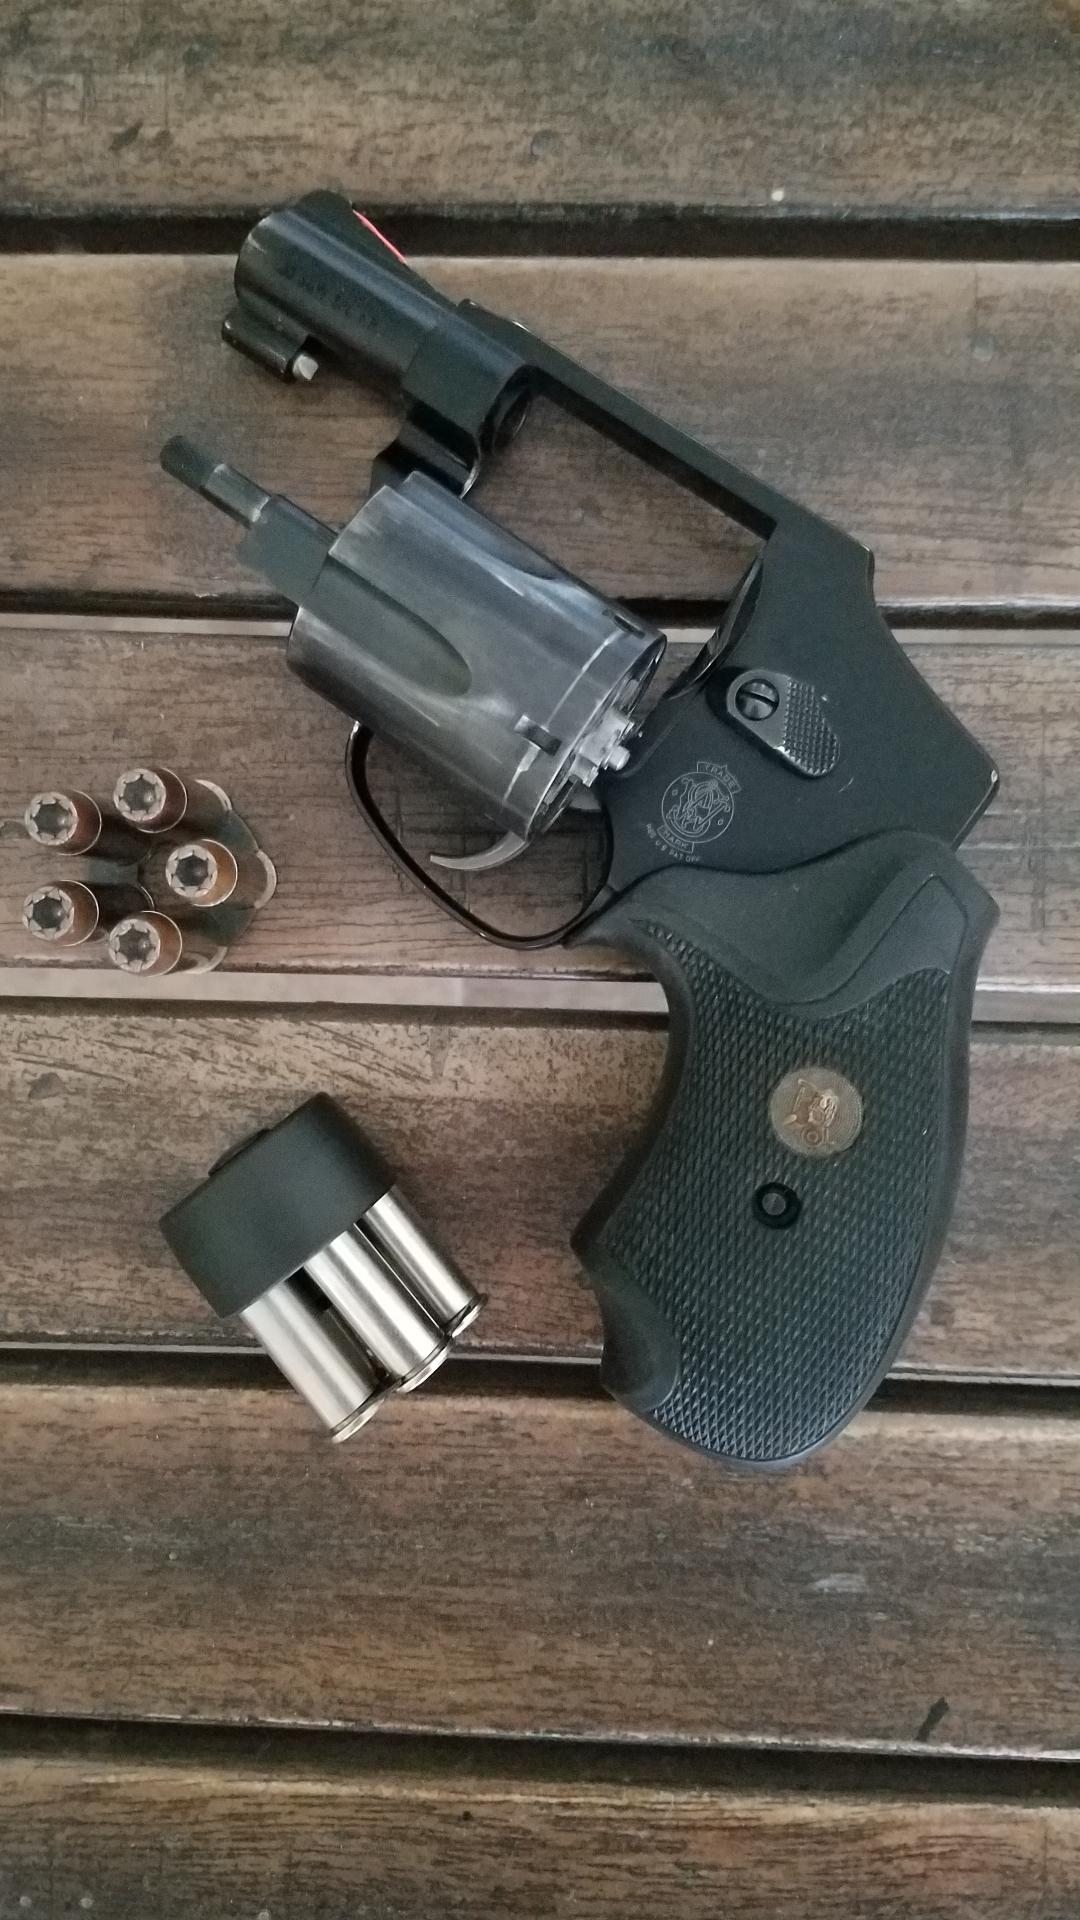 Pistol SD gun mag changes-screenshot_20190808-092149_gallery_1565276567908.jpg